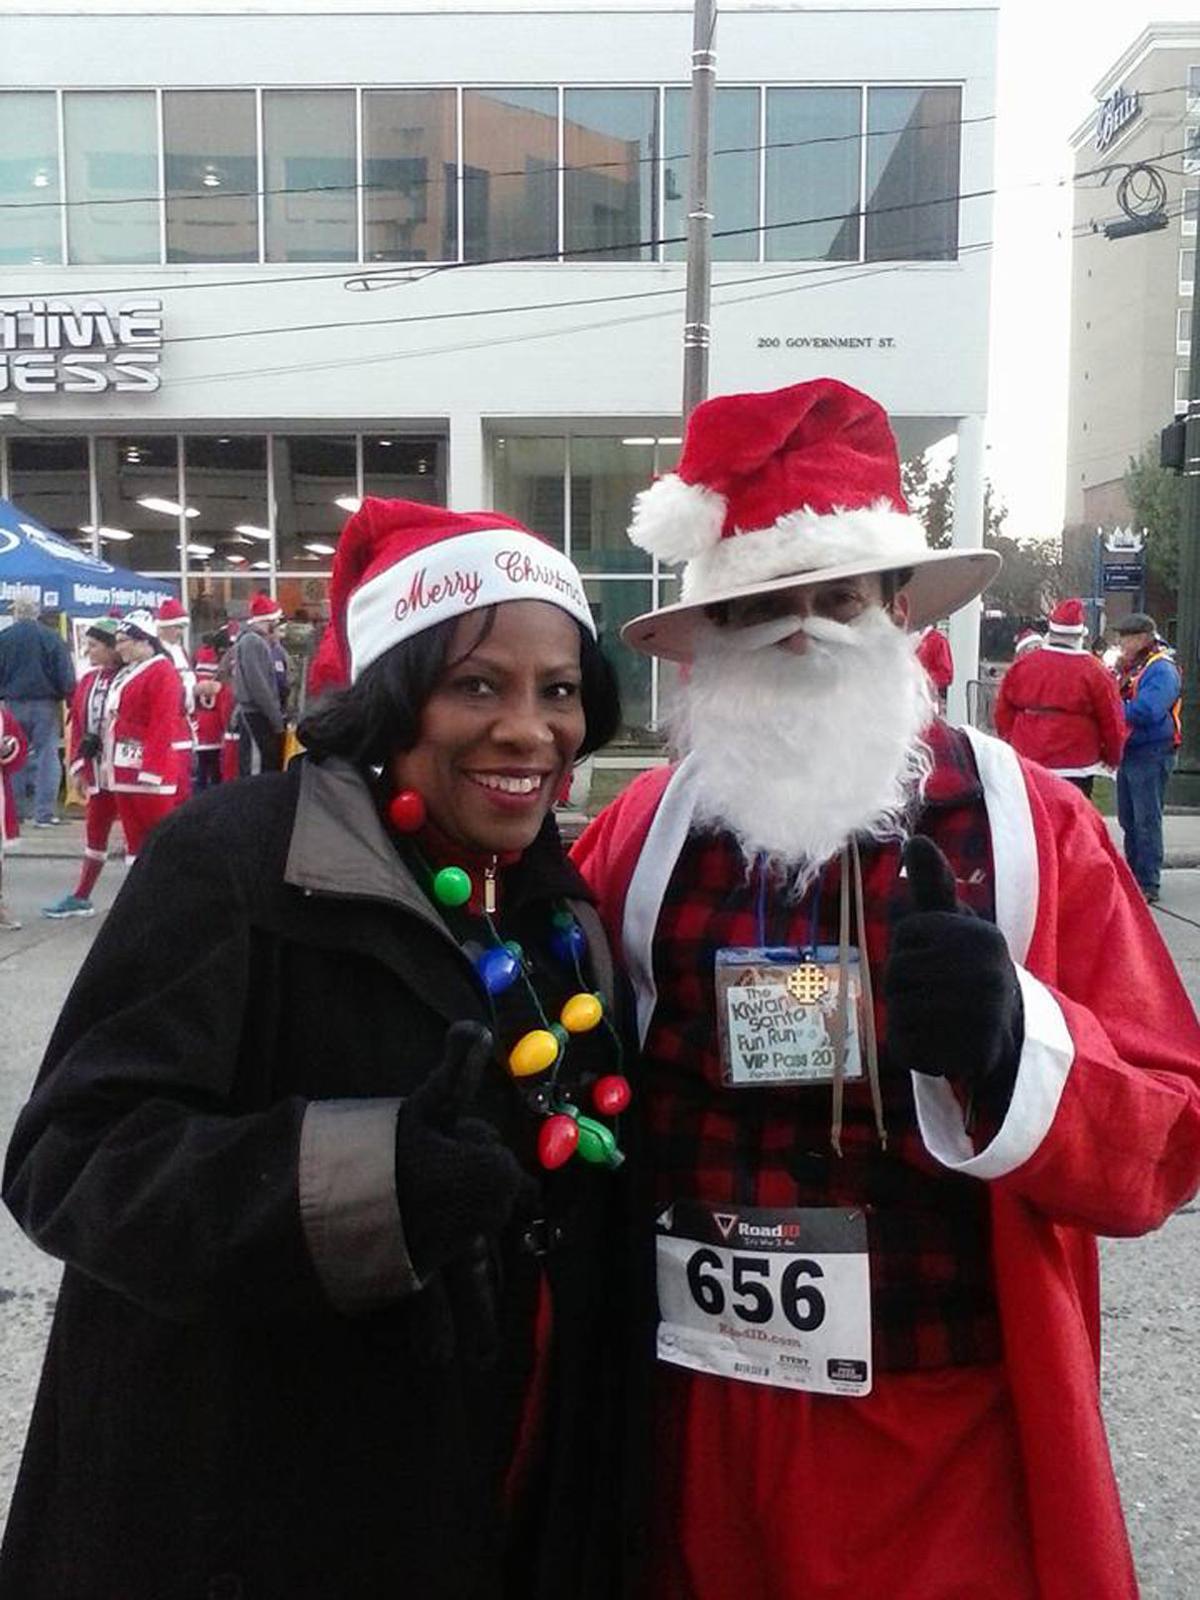 Keith Mayor Broome Santa Run Dec 9 2017.jpg